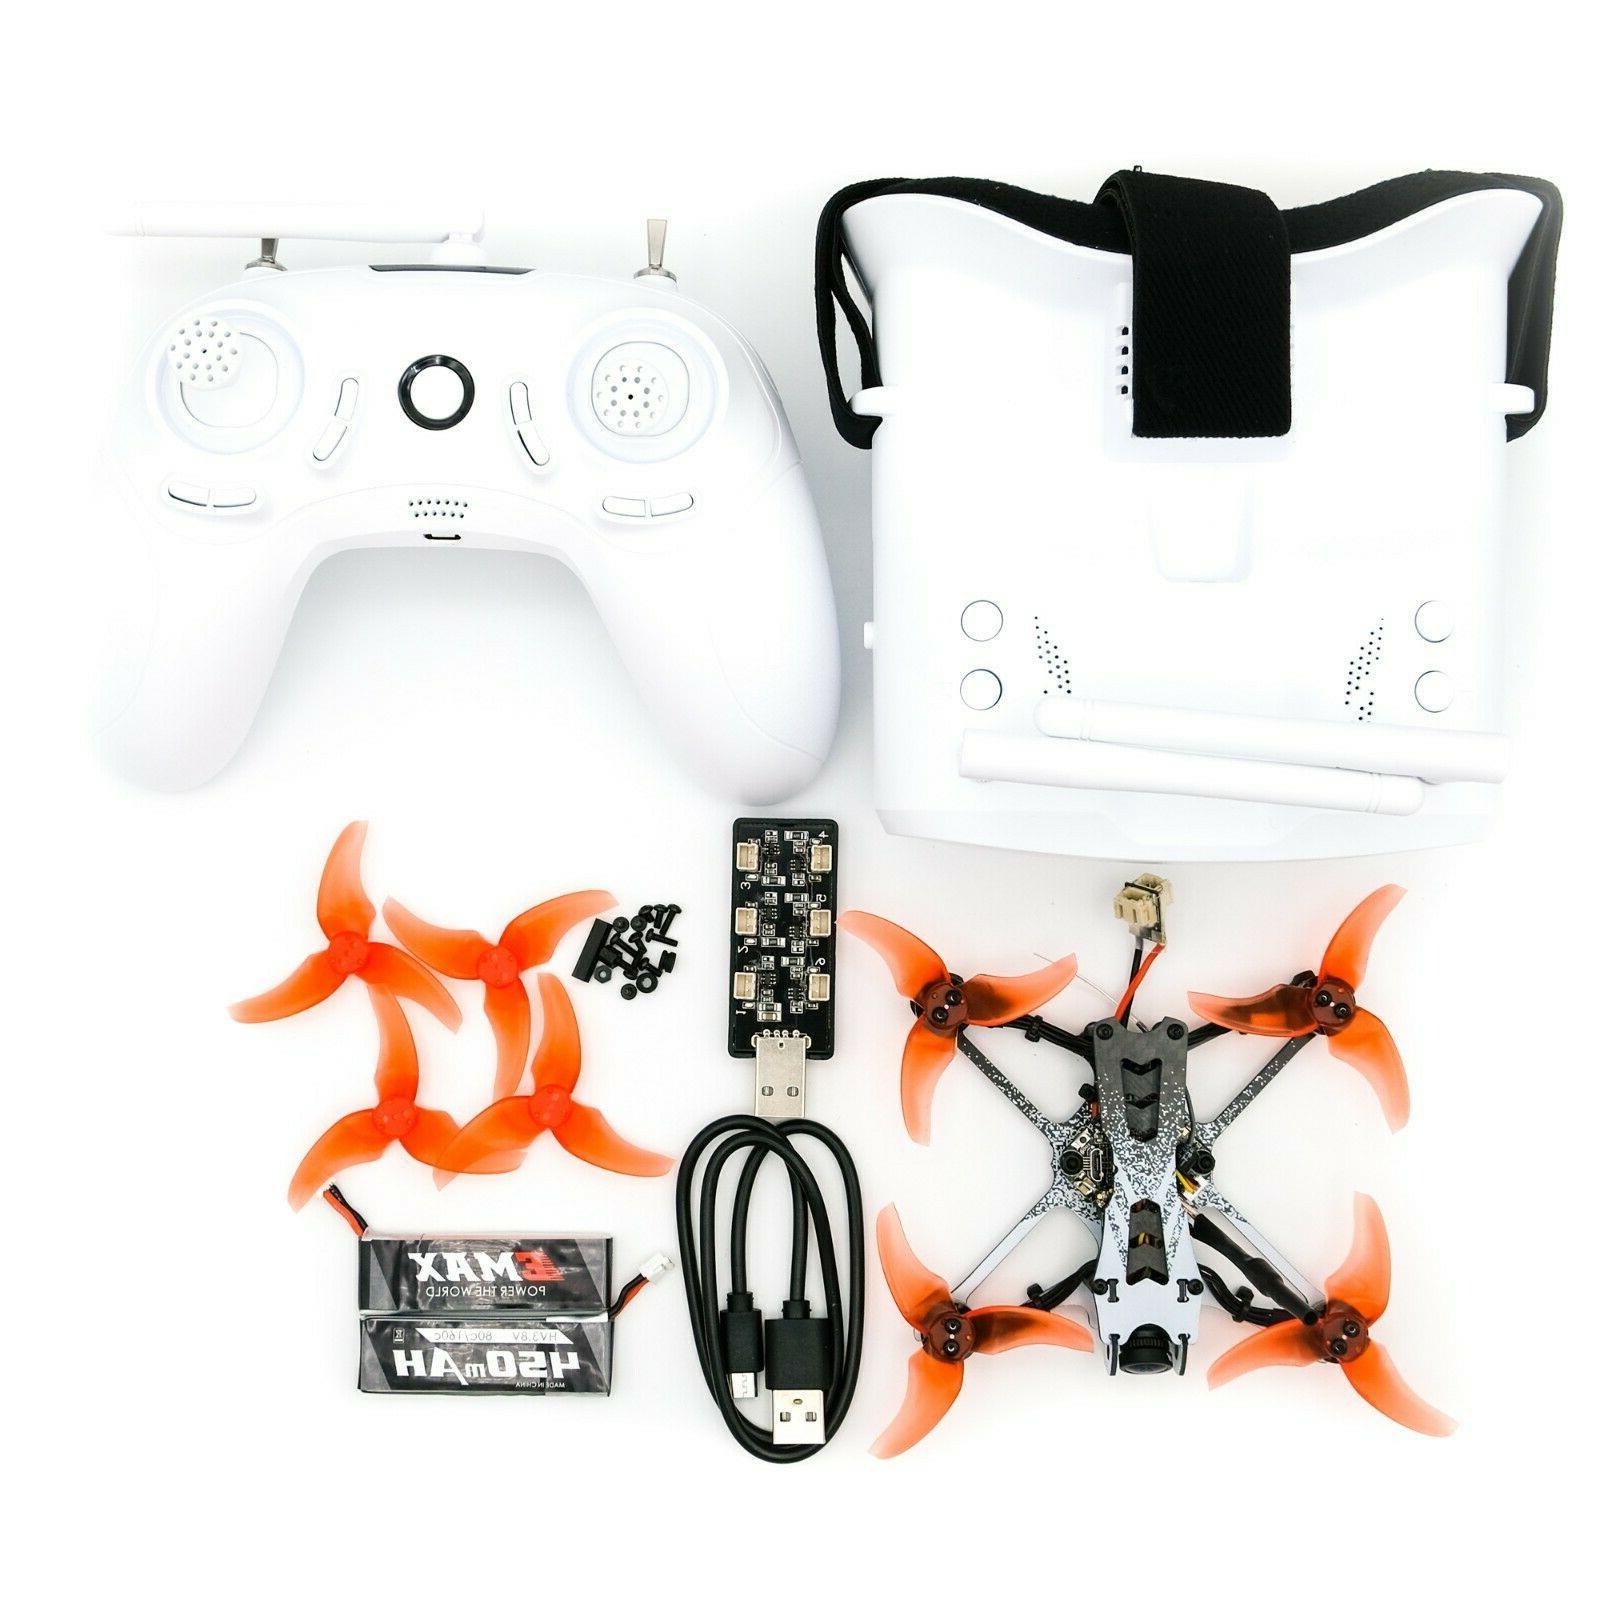 Tinyhawk Kit FPV Goggles and beginners